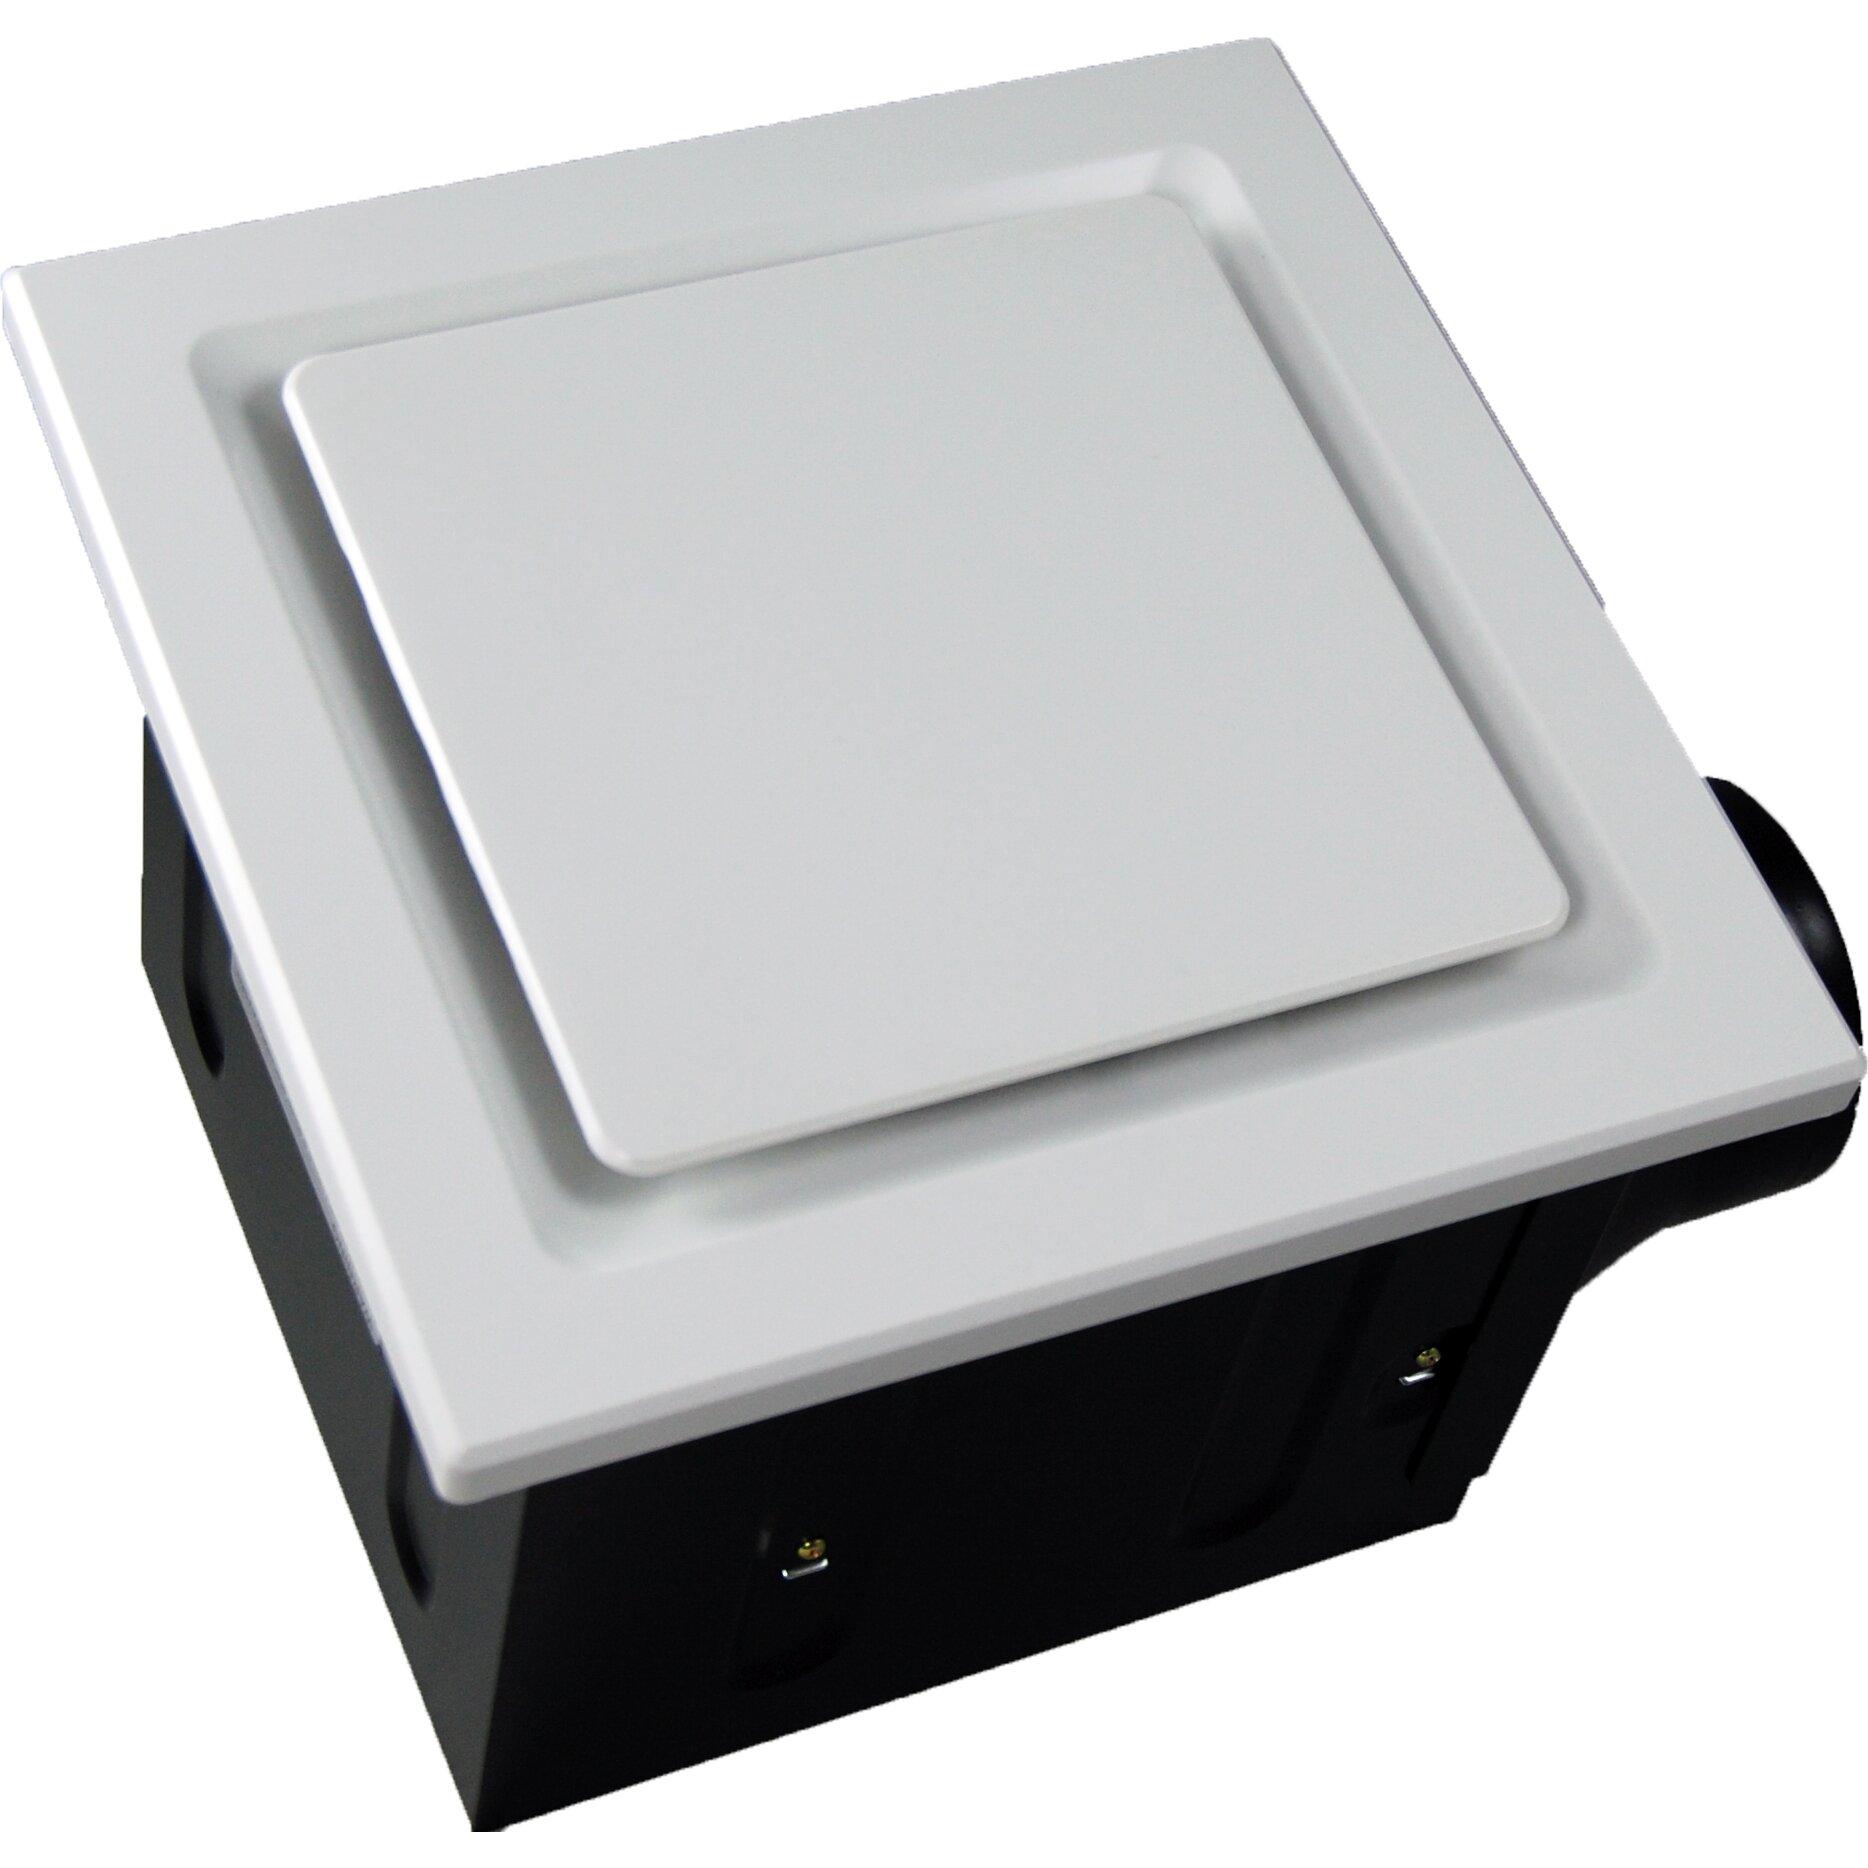 Aero Pure Super Quiet 80 CFM Bathroom Ventilation Fan. Aero Pure Super Quiet 80 CFM Bathroom Ventilation Fan   Reviews